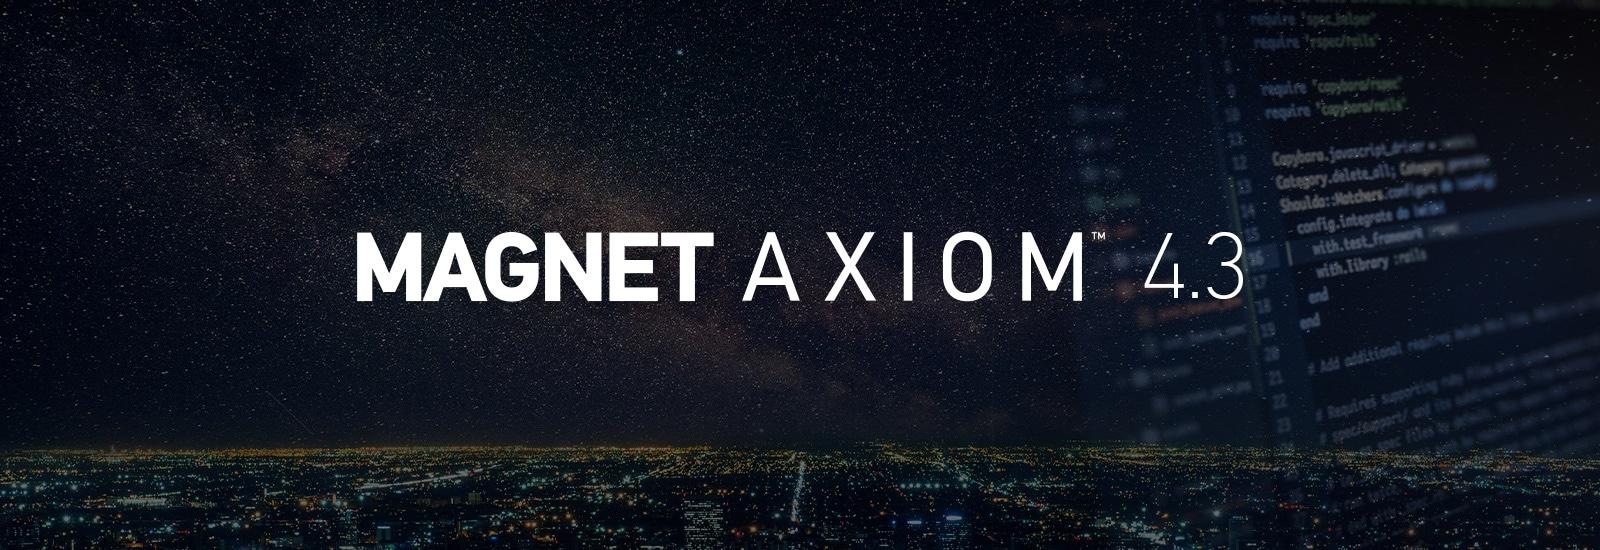 Magnet AXIOM 4.3